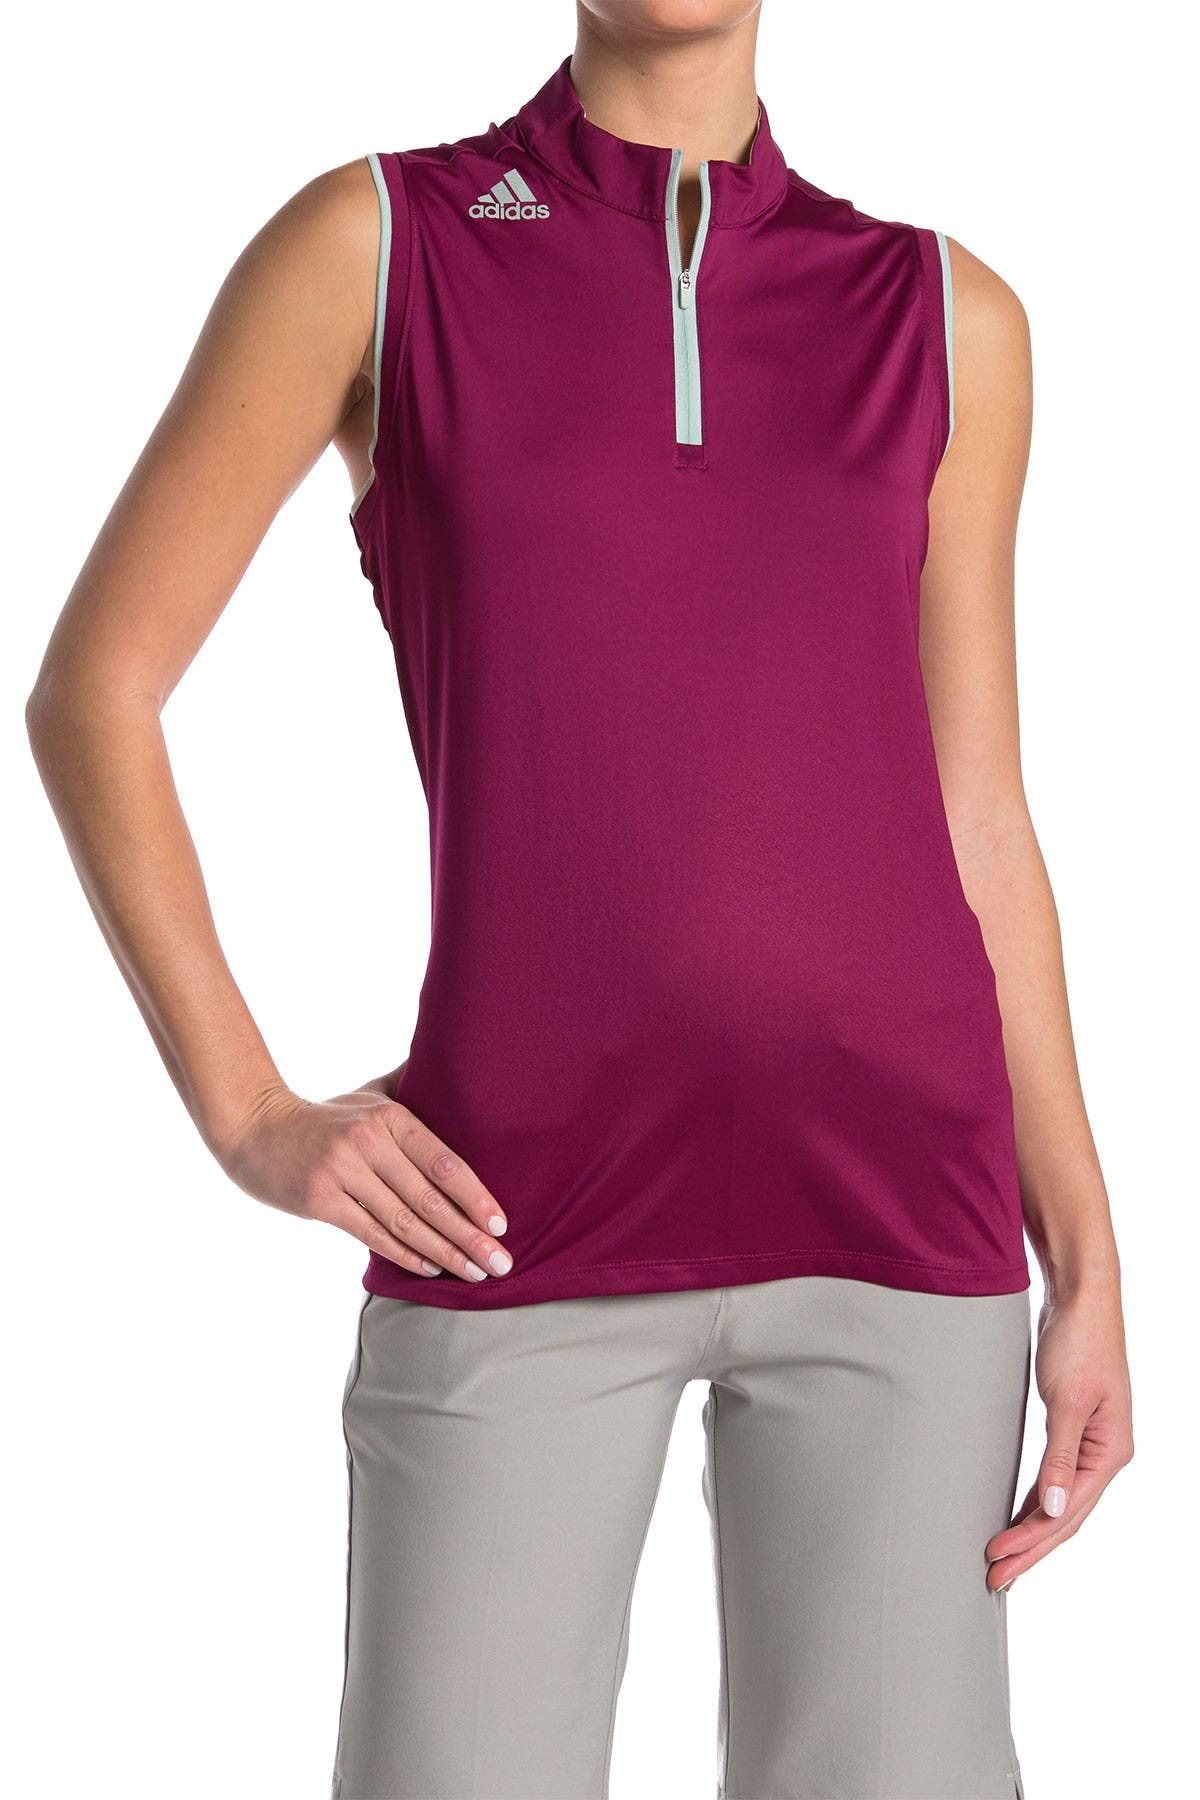 Image of Adidas Golf Gradient Quarter Zip Sleeveless Polo Shirt